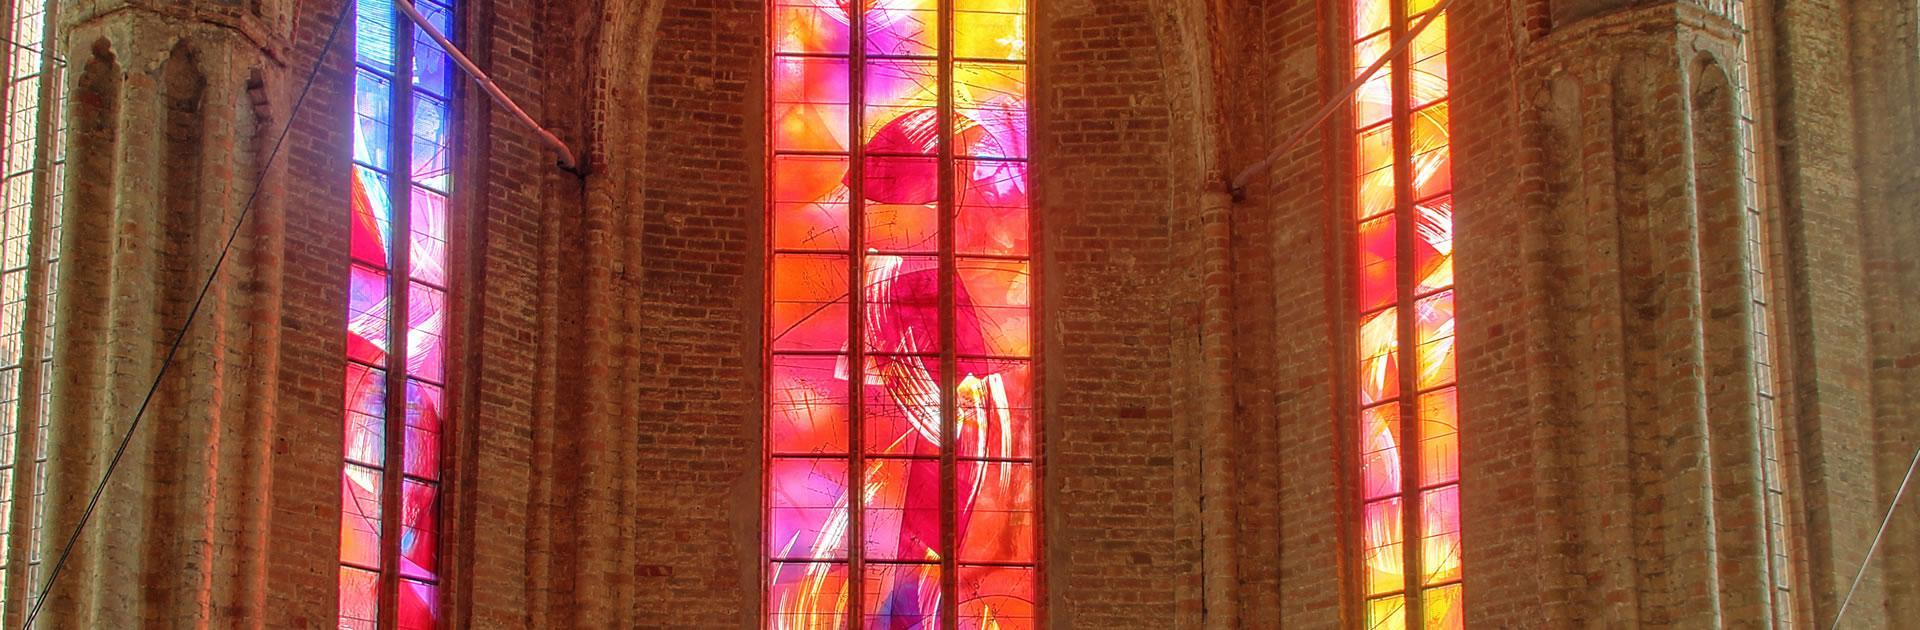 photo © Wittig/Lilienthal-Museum Nikolaikirche